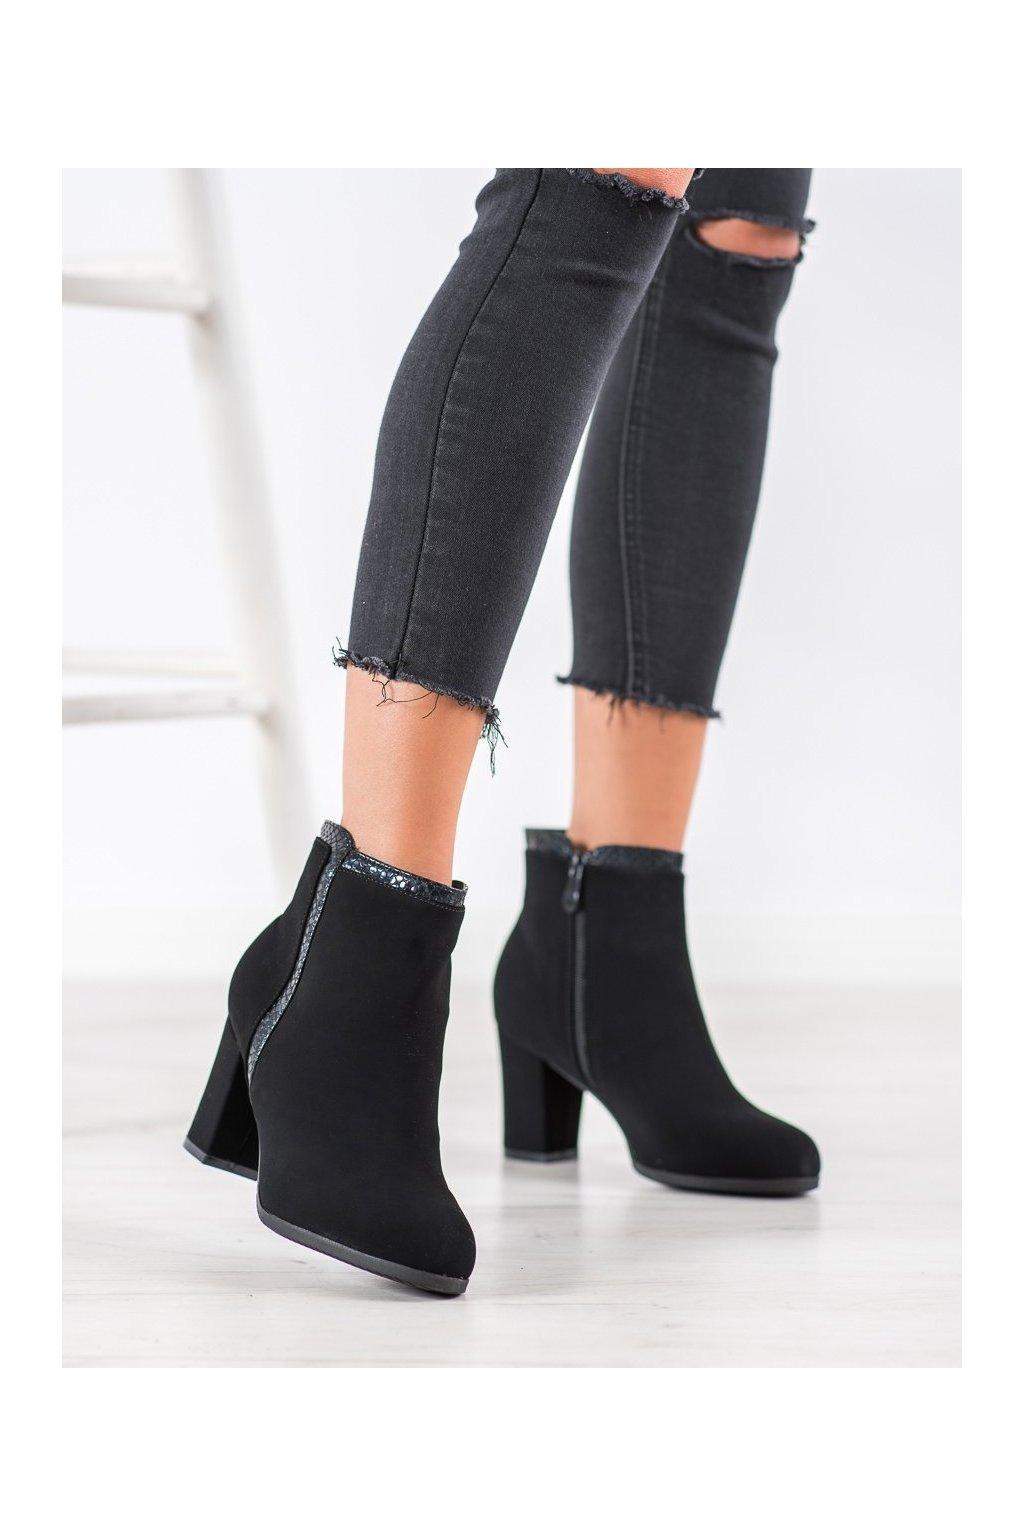 Čierne dámske topánky Weide kod Q325B